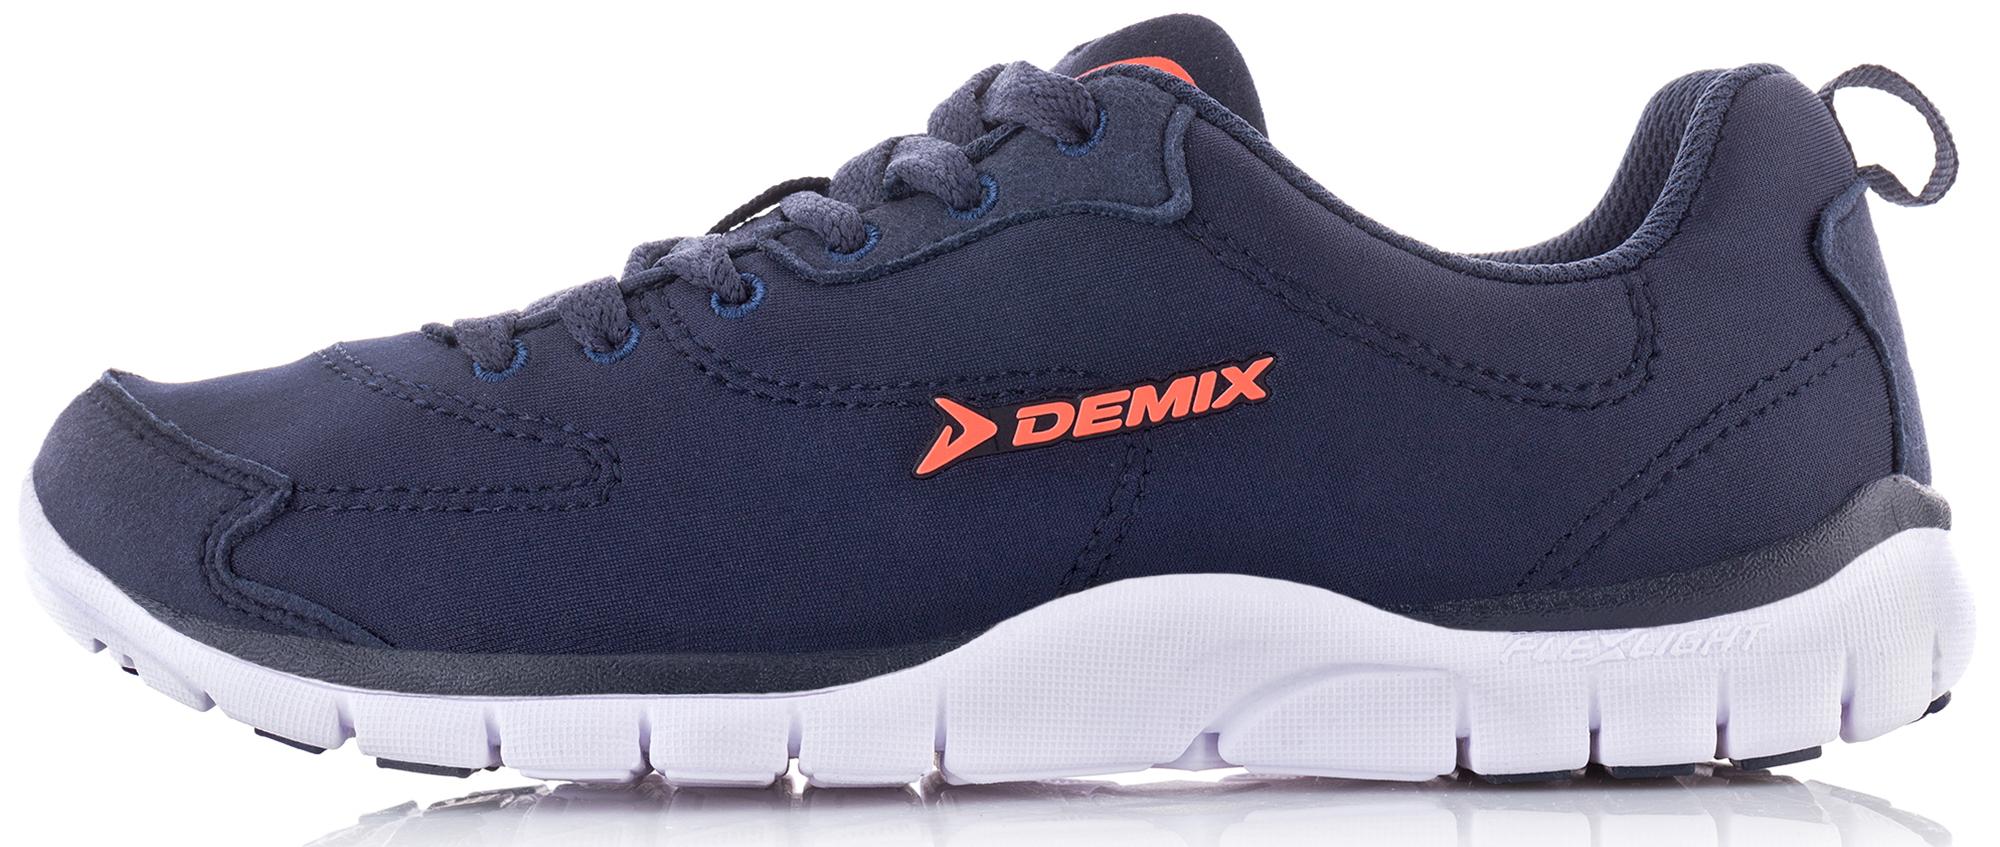 Demix Кроссовки женские Flexlight, размер 35